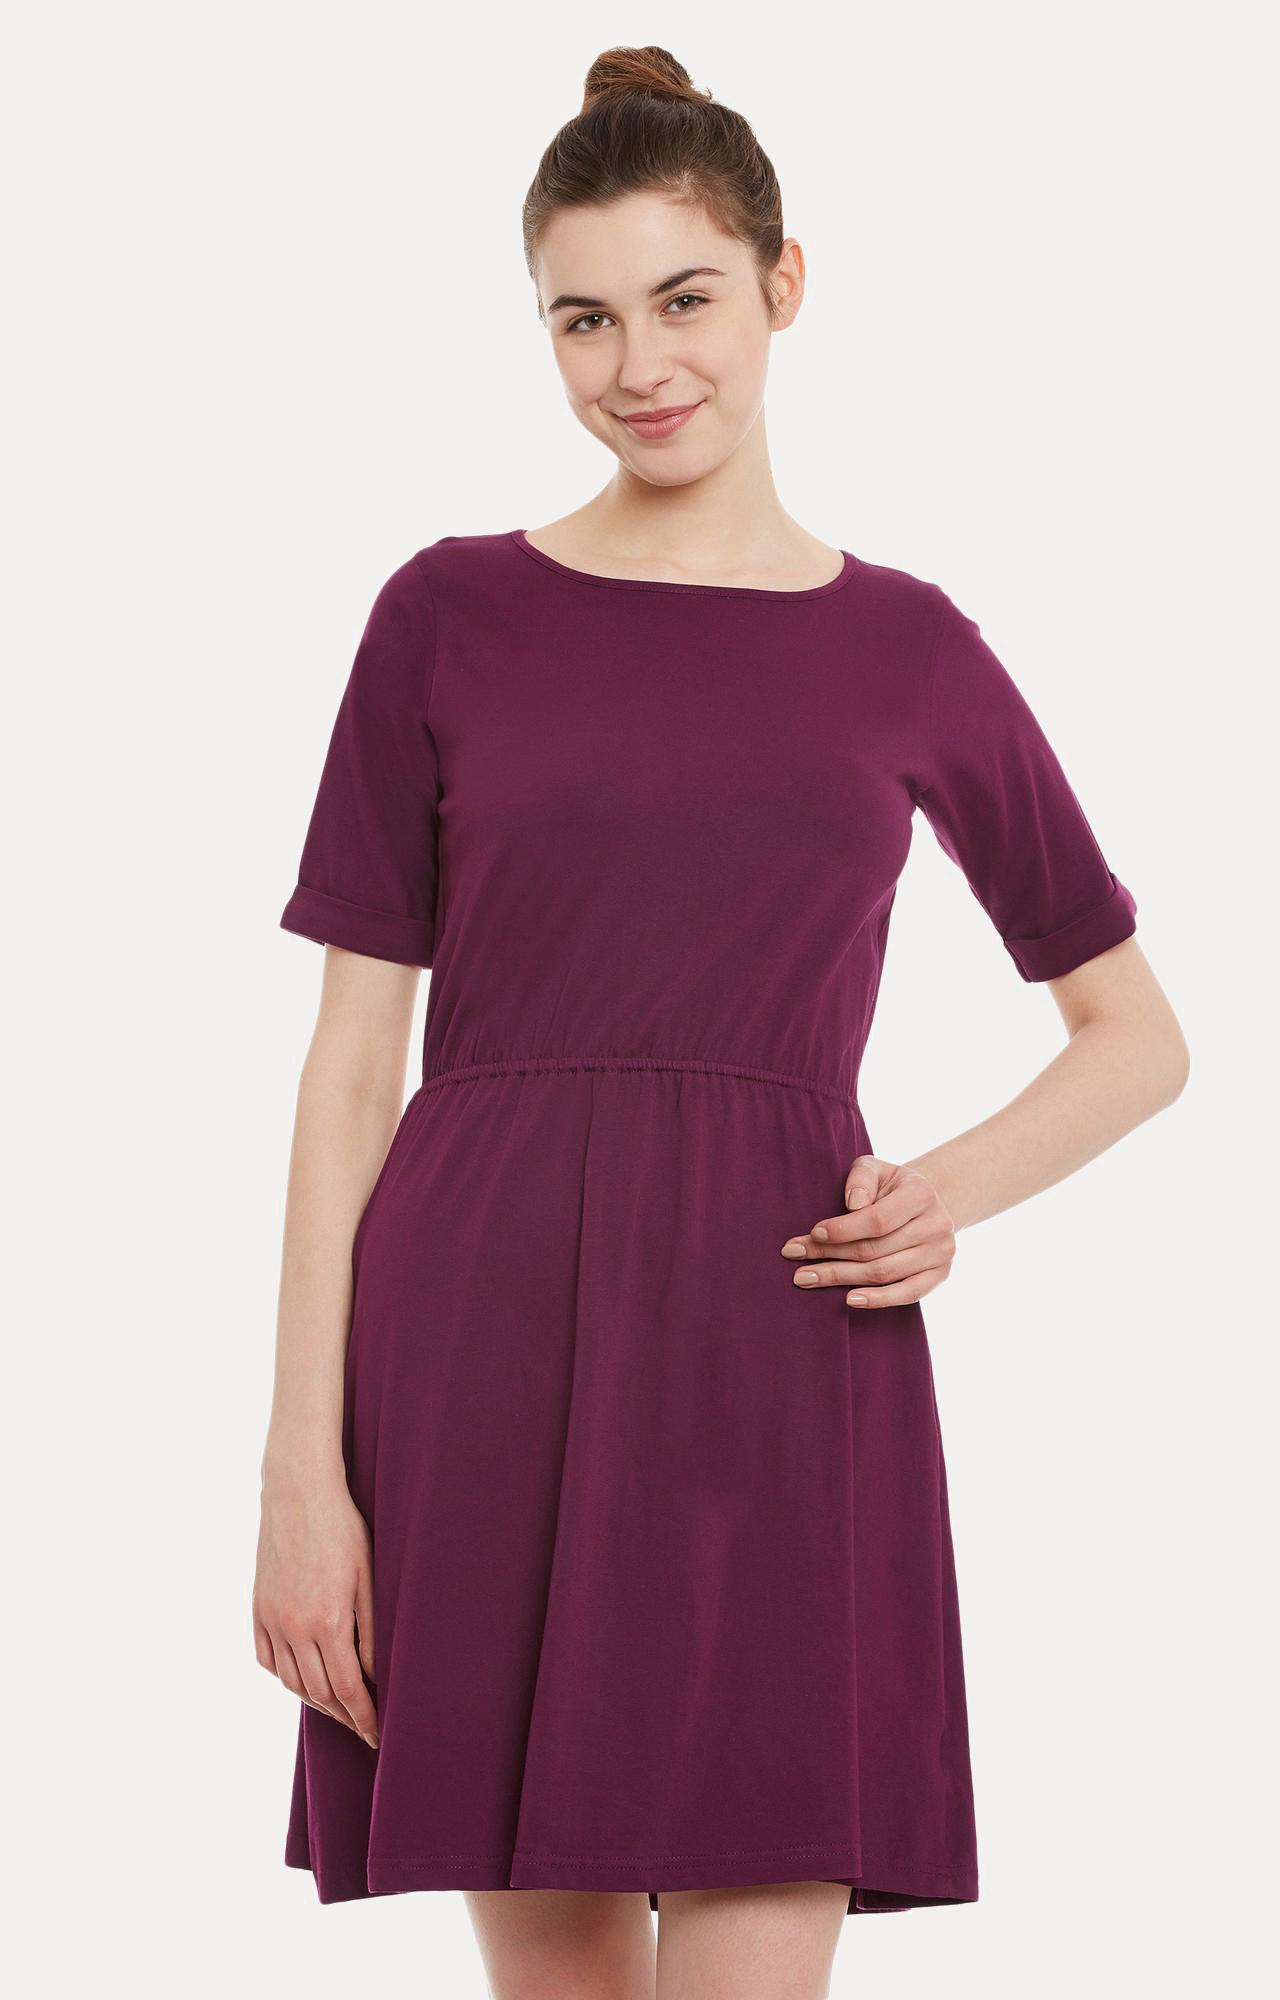 MISS CHASE   Magenta Solid Knee Long Skater Dress